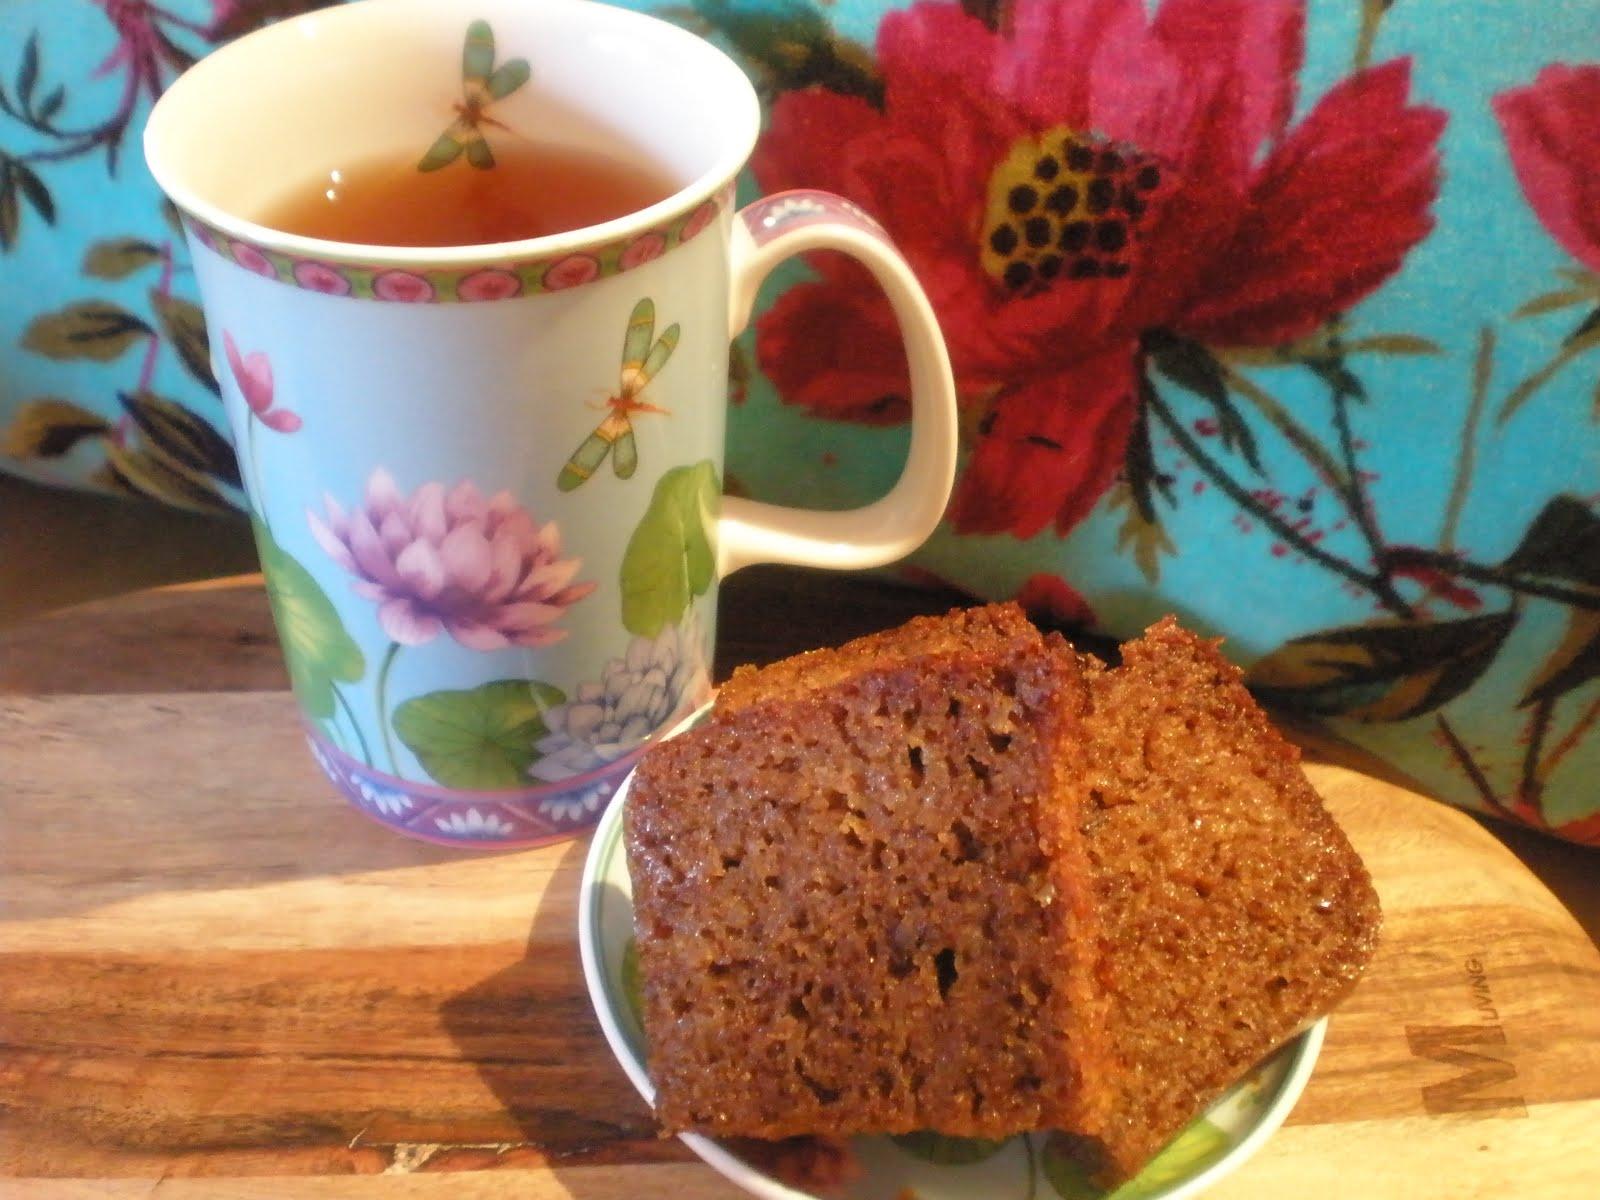 Morning Coffee With Cake Or Teacake